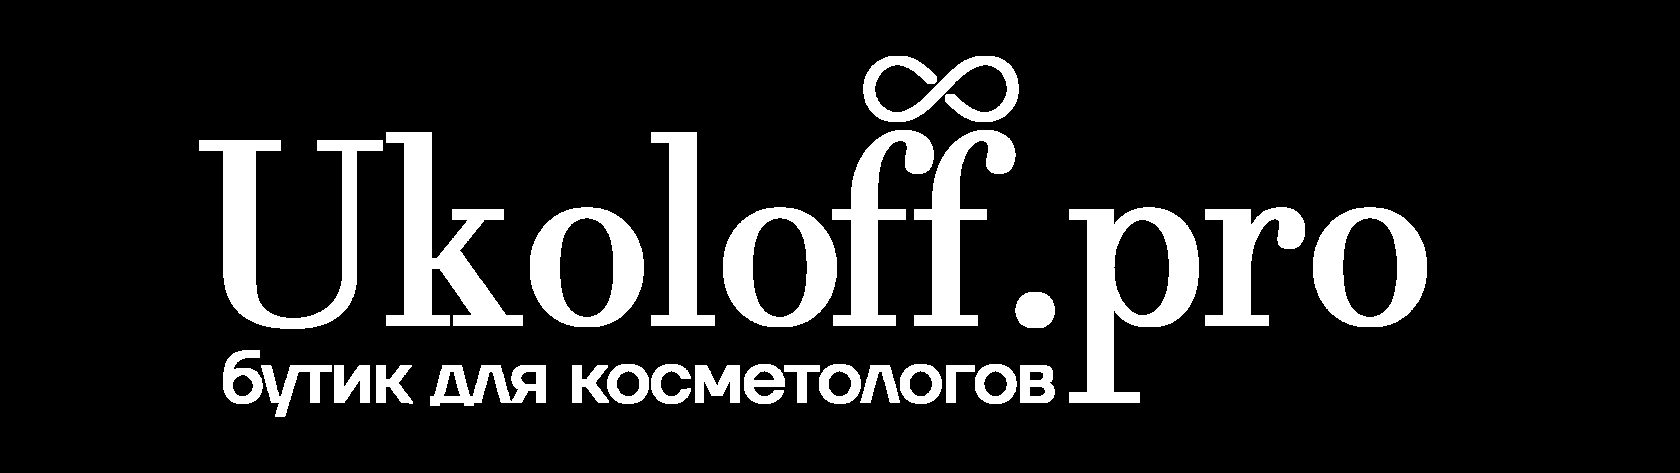 UKOLOFF.PRO